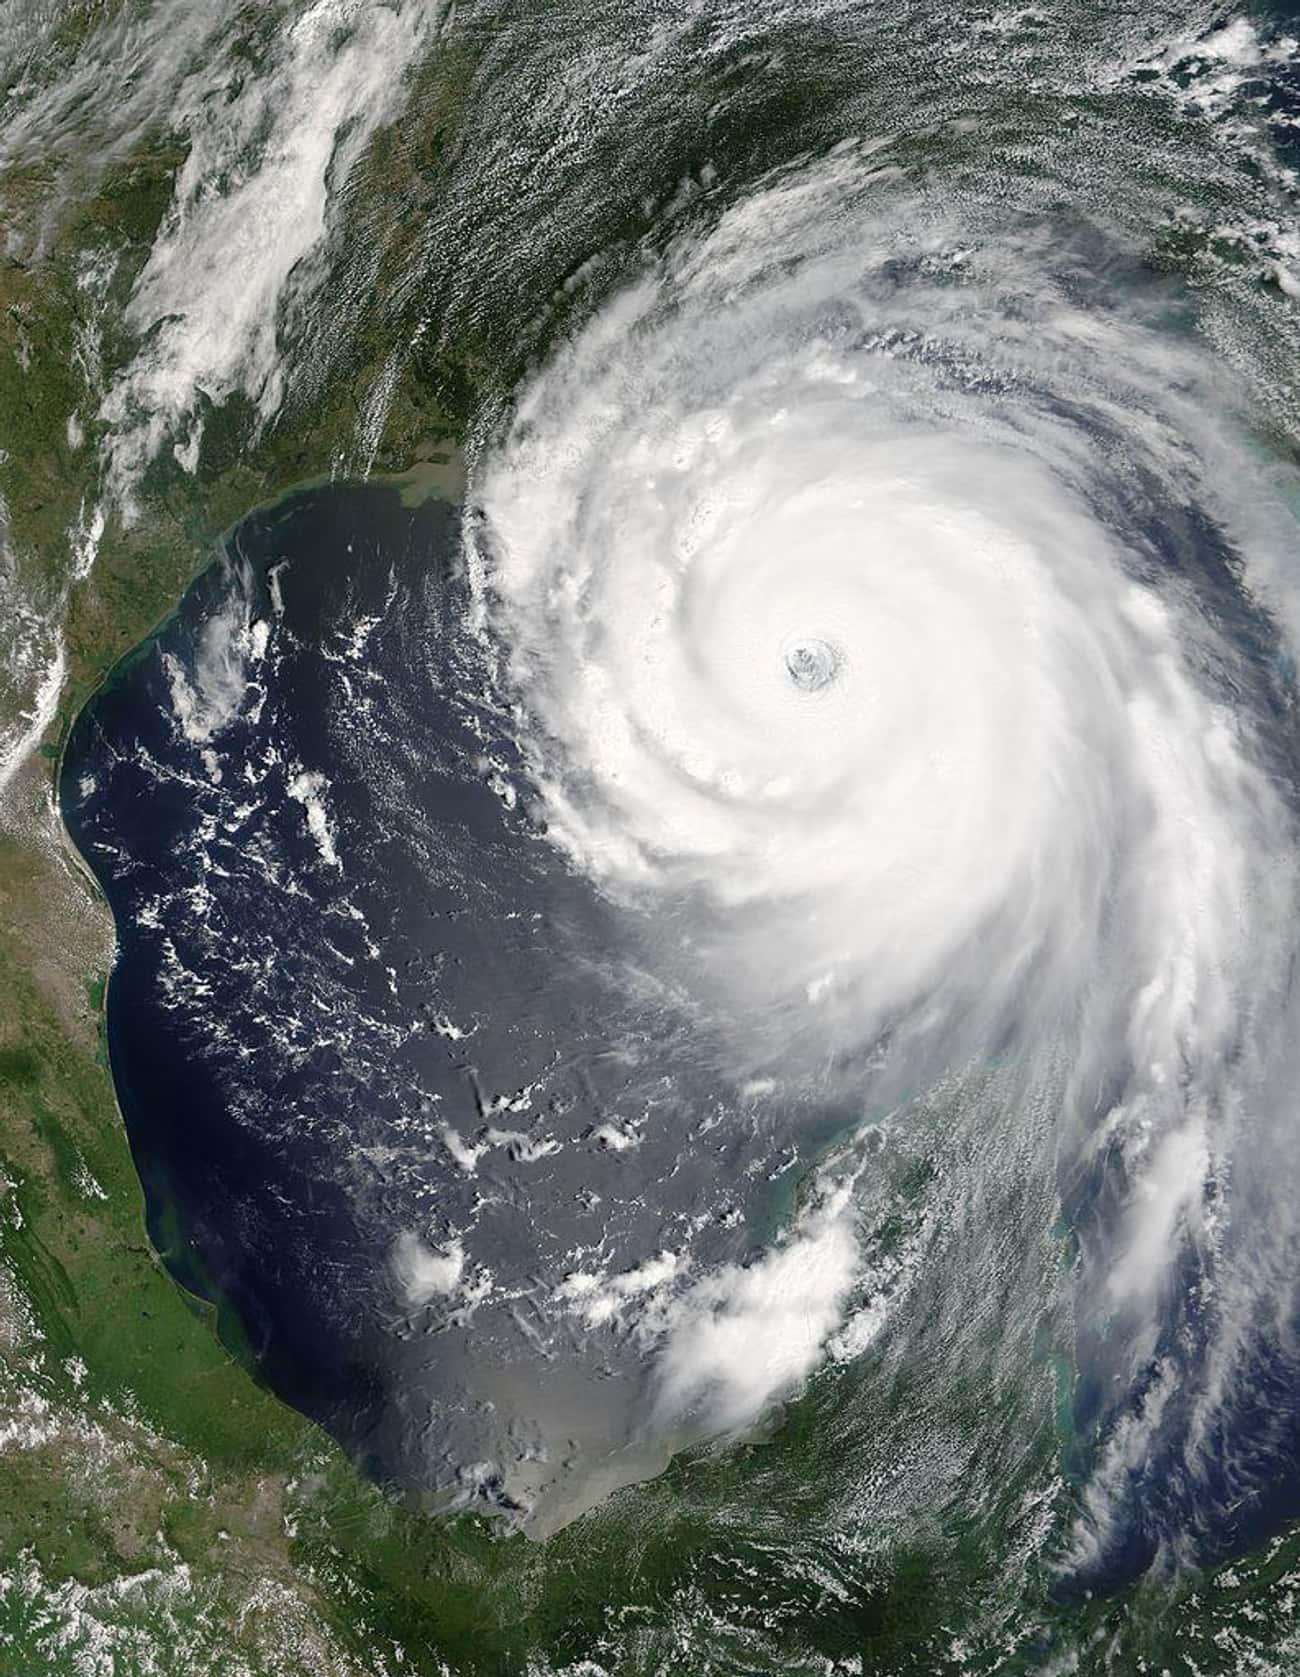 The Response to Hurricane Katrina